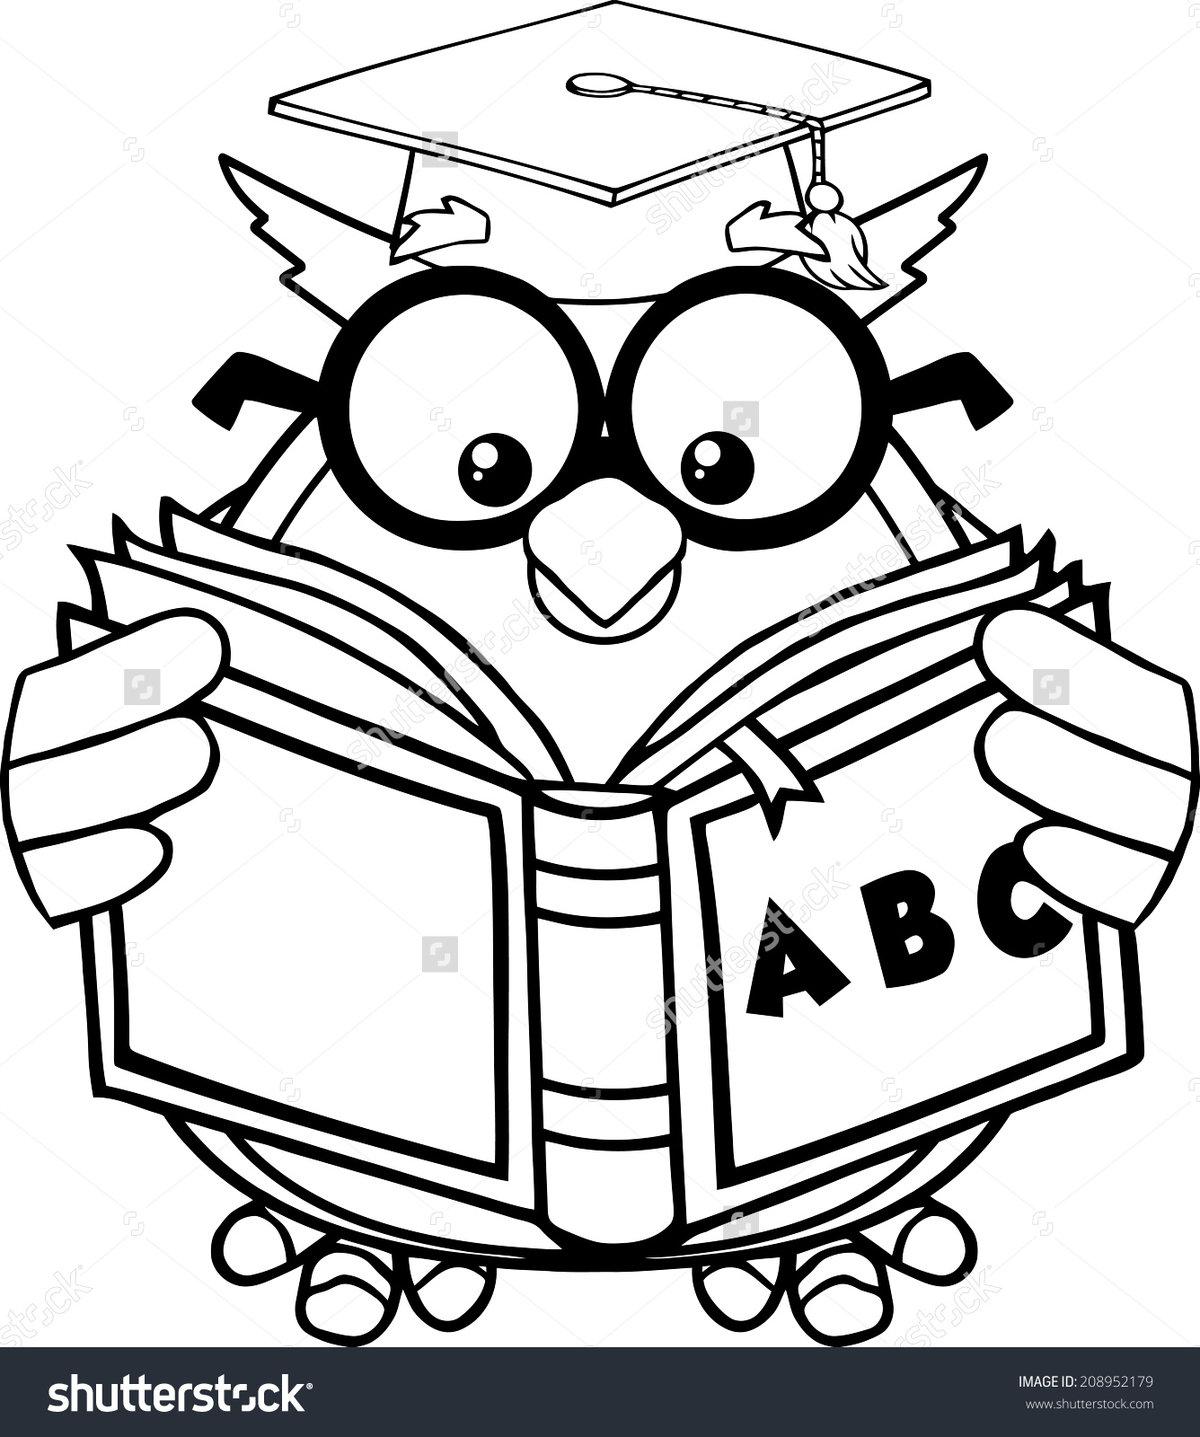 a cartoon usa engine diagram and wiring diagram card from user rh yandex com Simplicity Cartoon Cartoon Eye Diagram